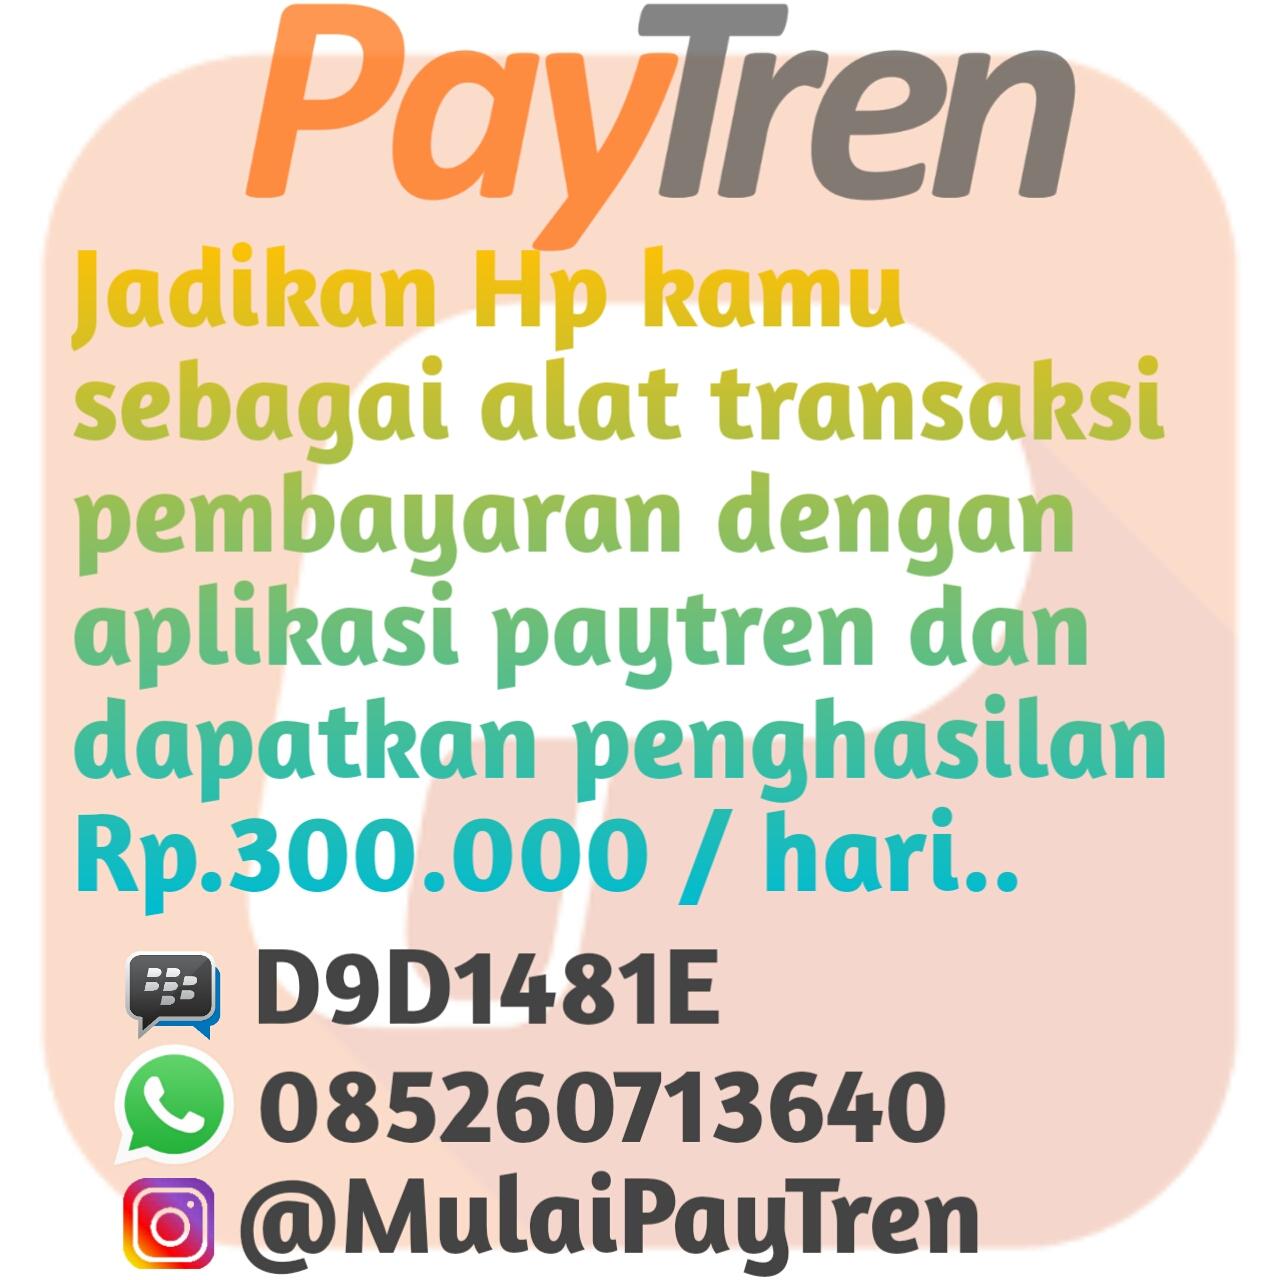 Gabung di Paytren